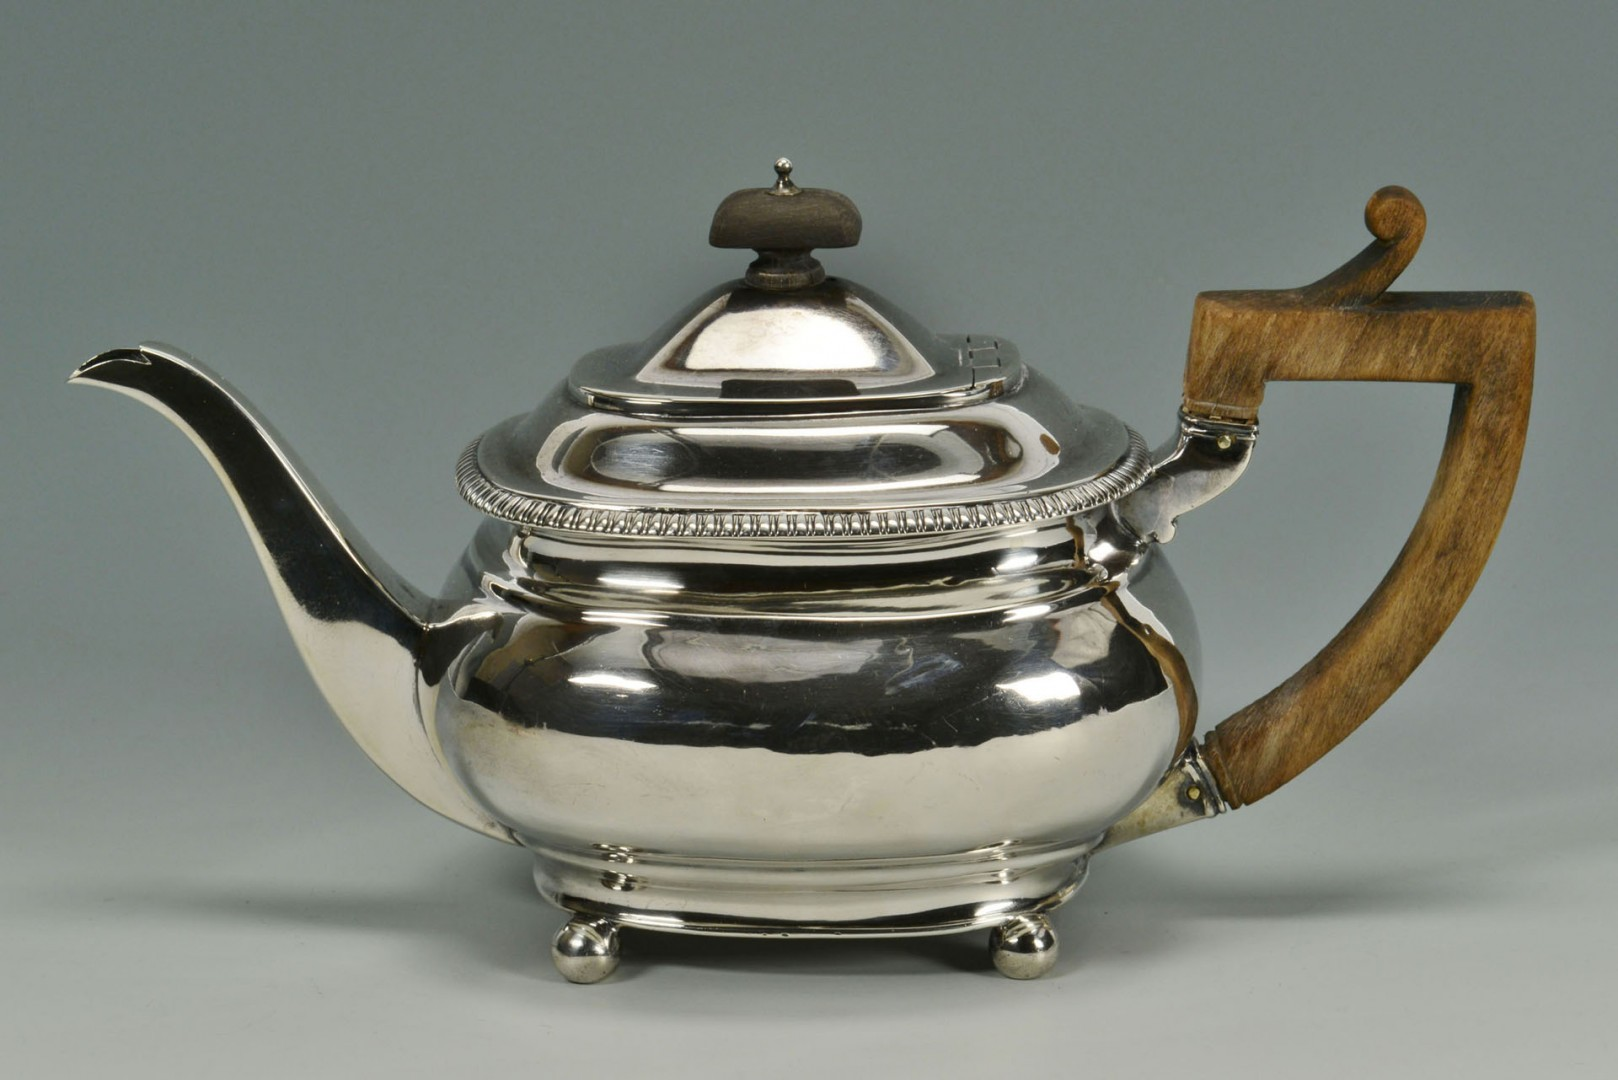 Lot 305: George III Sterling Silver Teapot